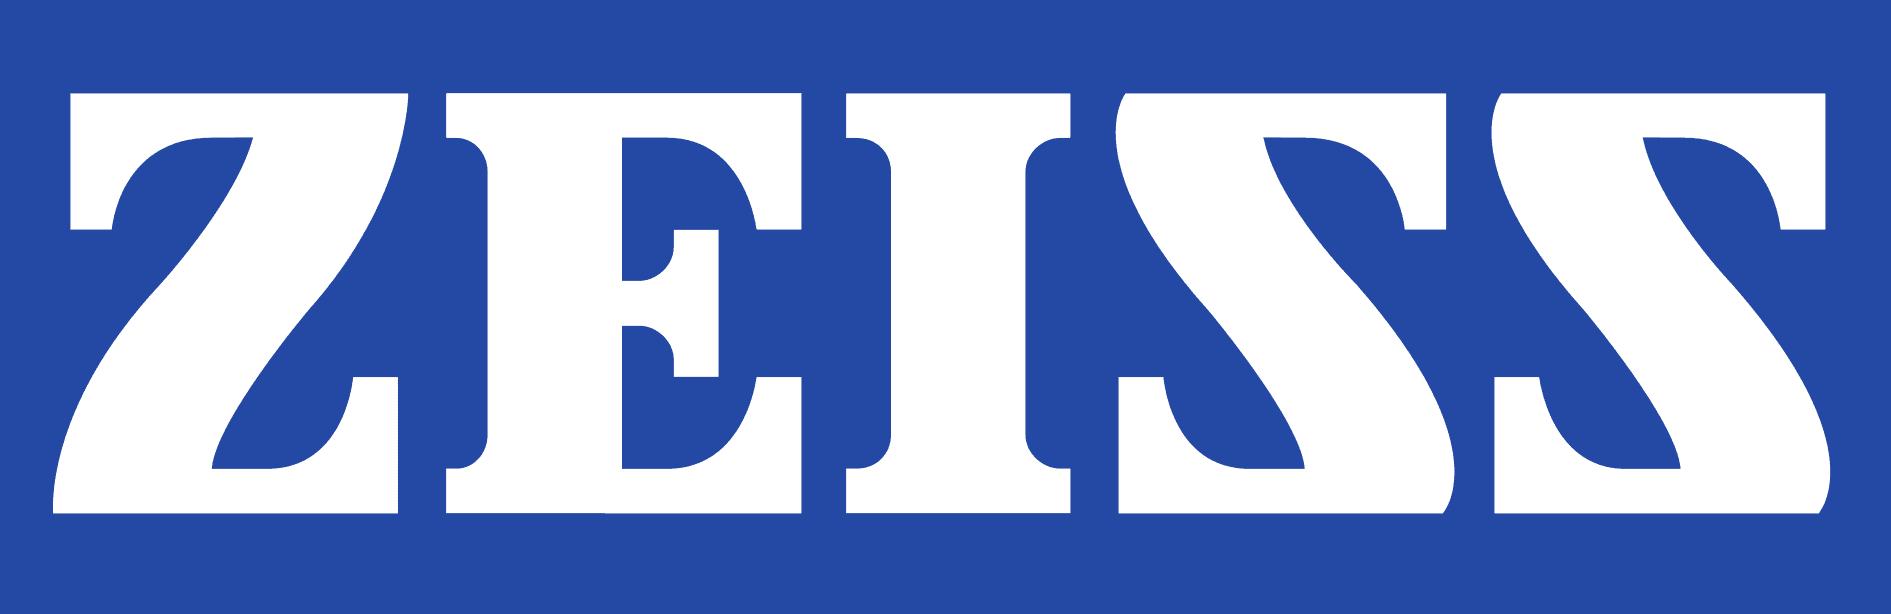 Cámaras de fotos Zeiss